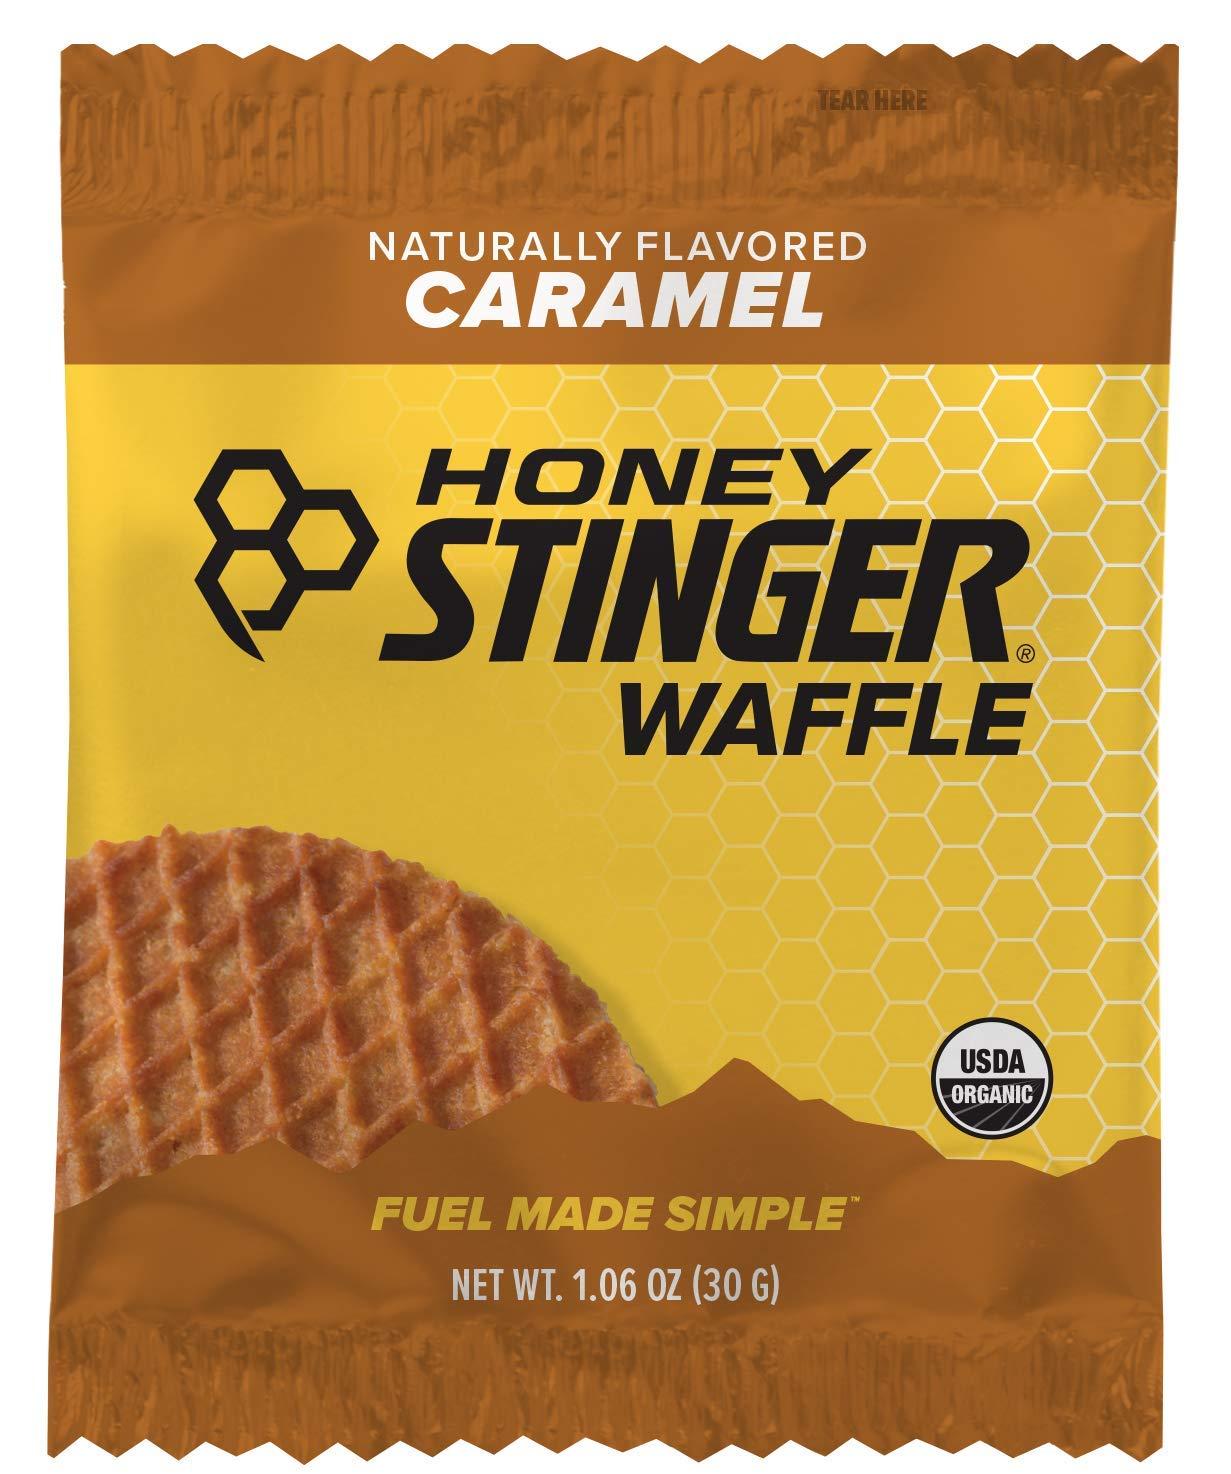 Prime Members: 16-Ct 1.06oz Honey Stinger Organic Sports Nutrition Waffle (Carmel) $8 w/ S&S & More